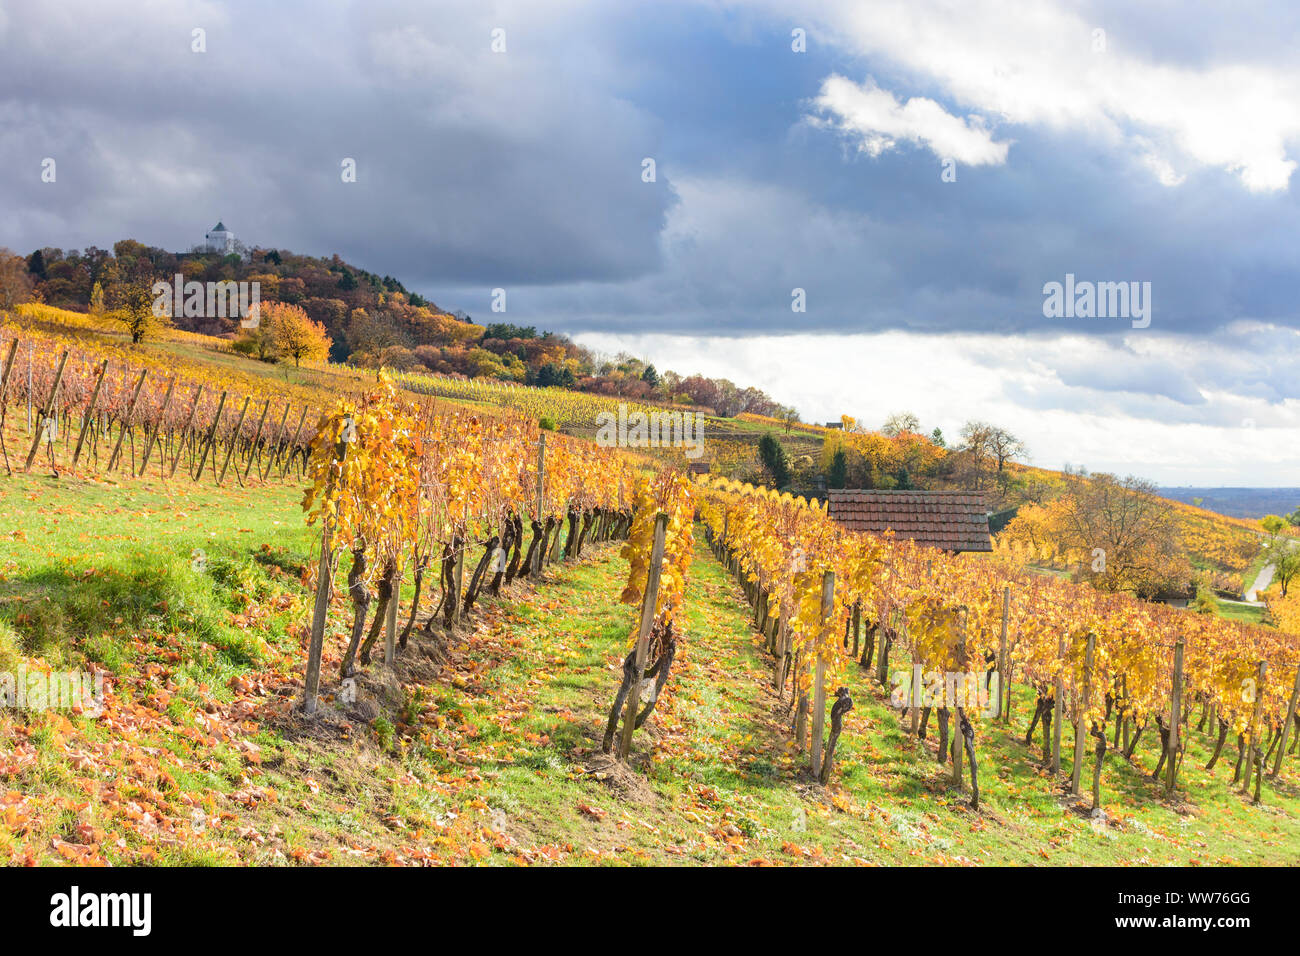 Heppenheim (Bergstraße), vineyard, vineyards of wine growing area Bergstrasse, castle Starkenburg, golden autumn, yellow vine leafs, hill, sunny in Bergstraße, Hessen, Hesse, Germany Stock Photo